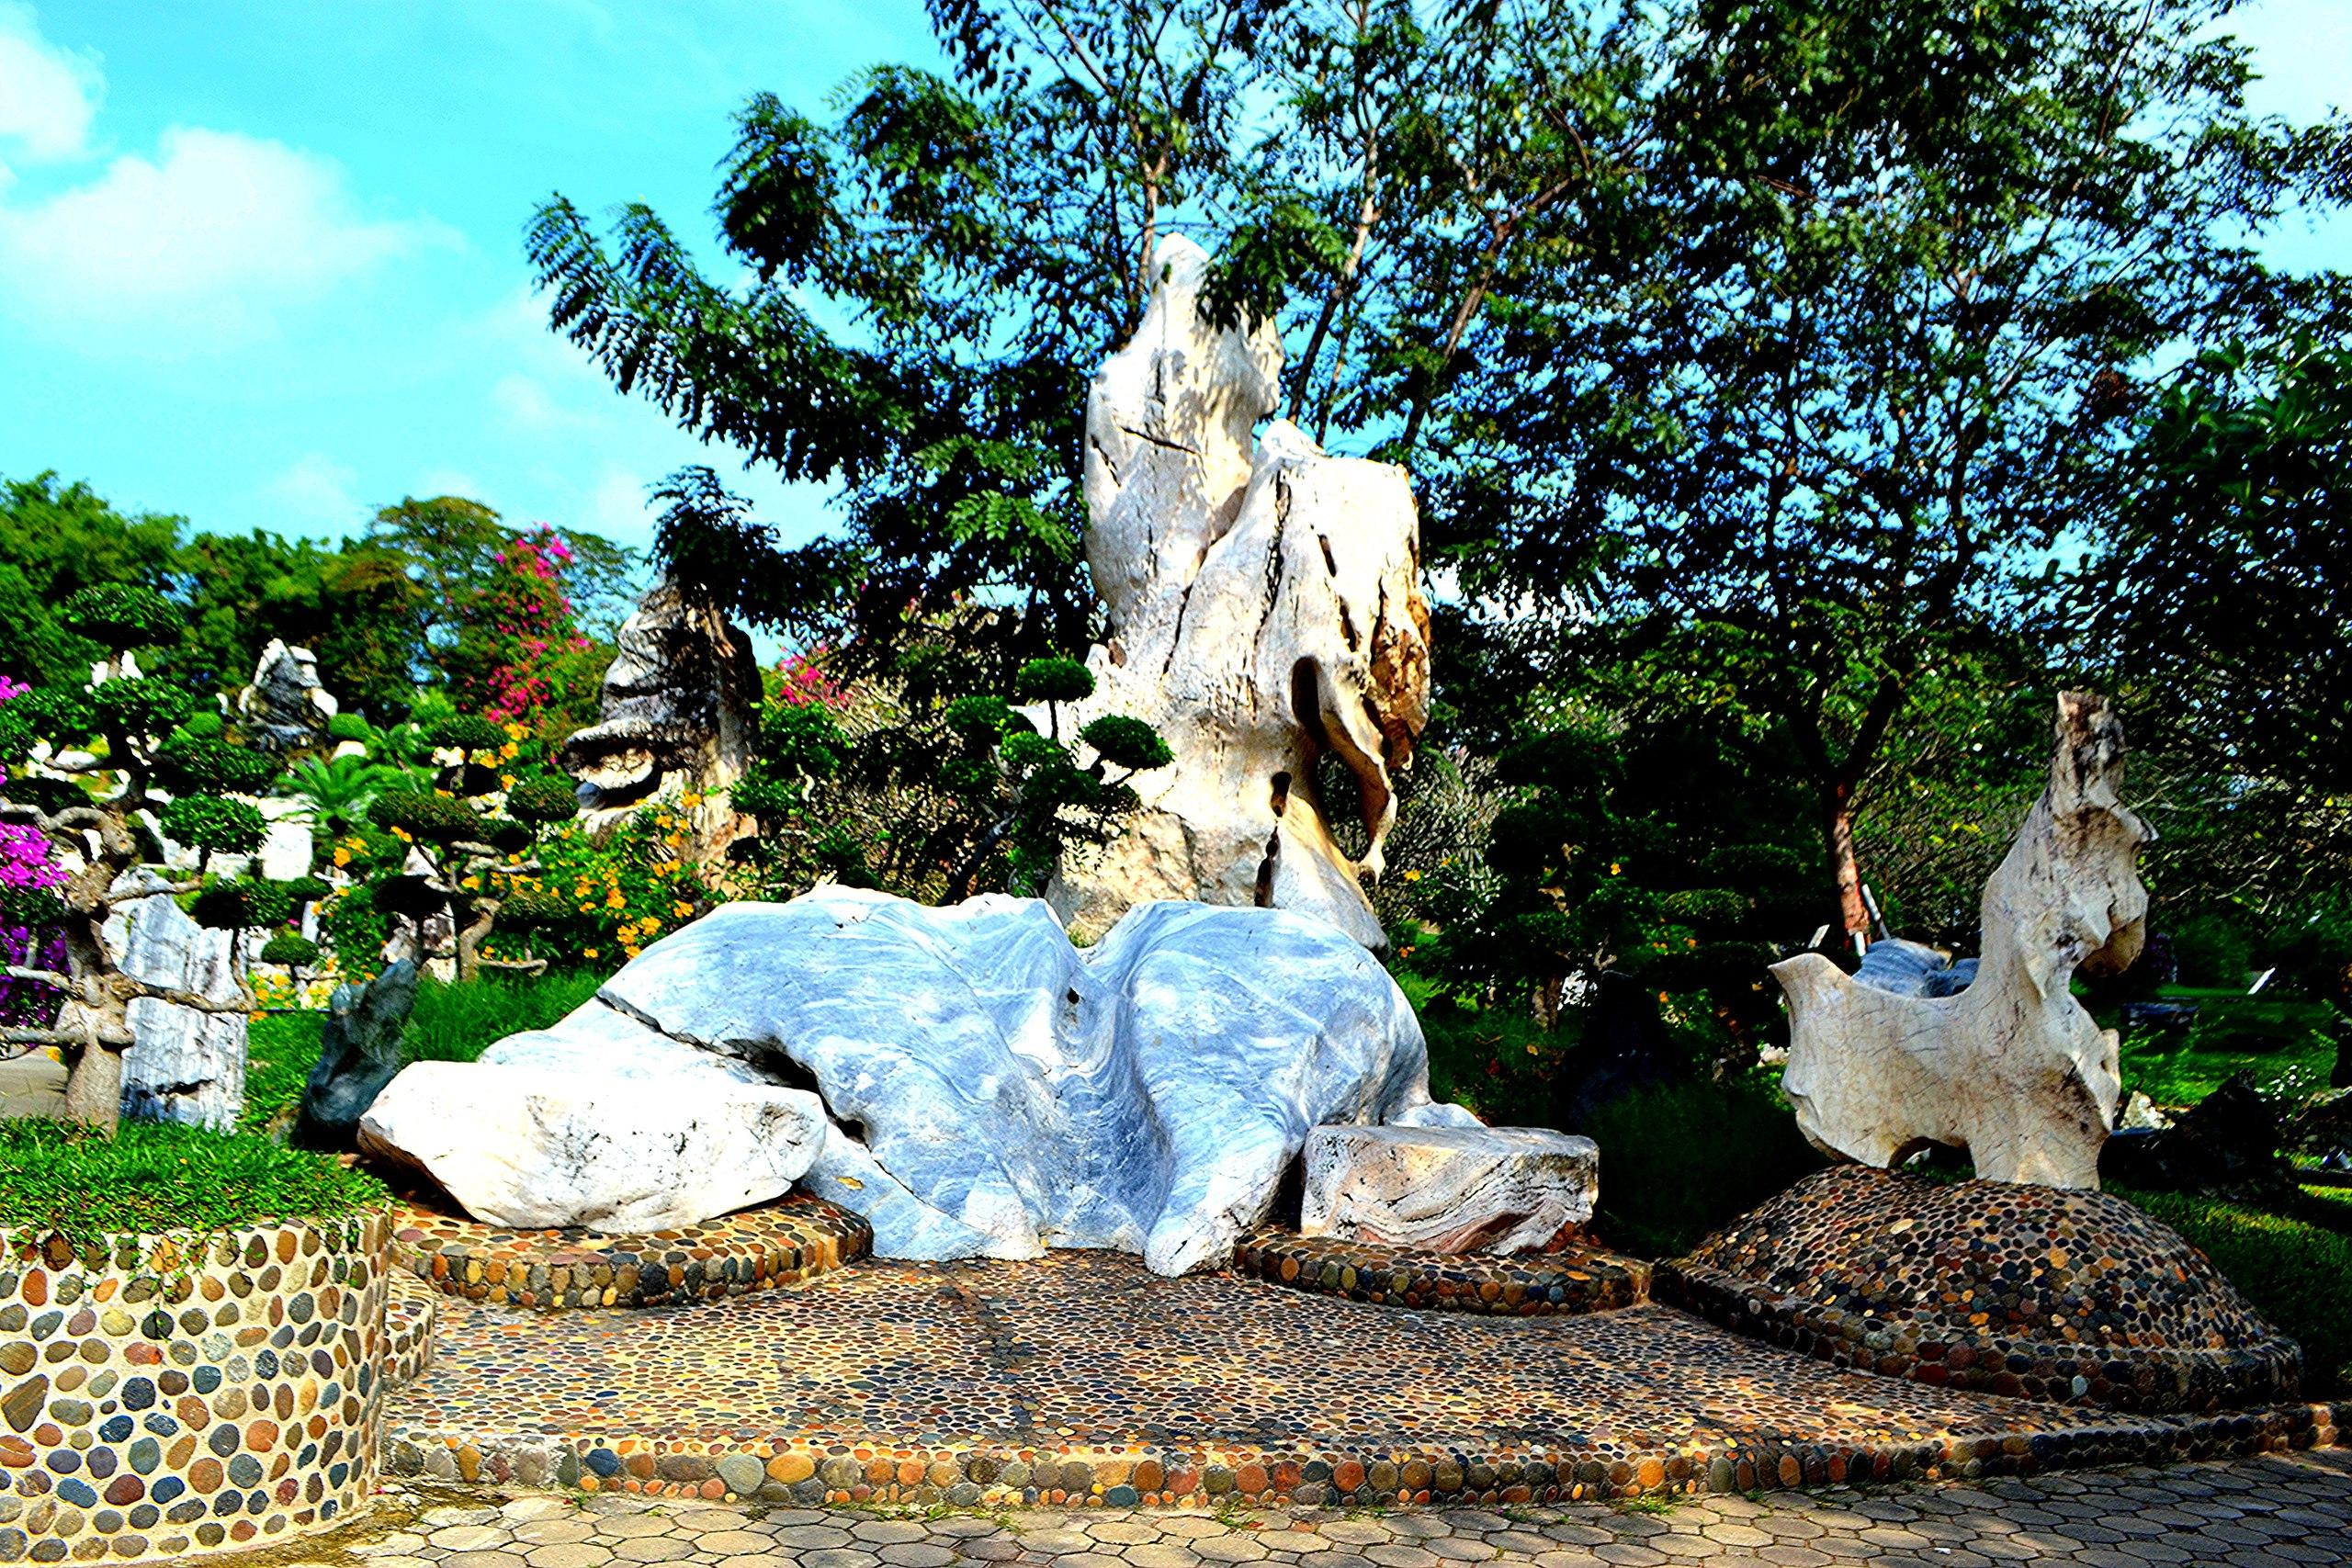 Елена Руденко ( Валтея ). Таиланд. Парк миллионолетних камней и крокодиловая ферма. MtqRTXJwHa8